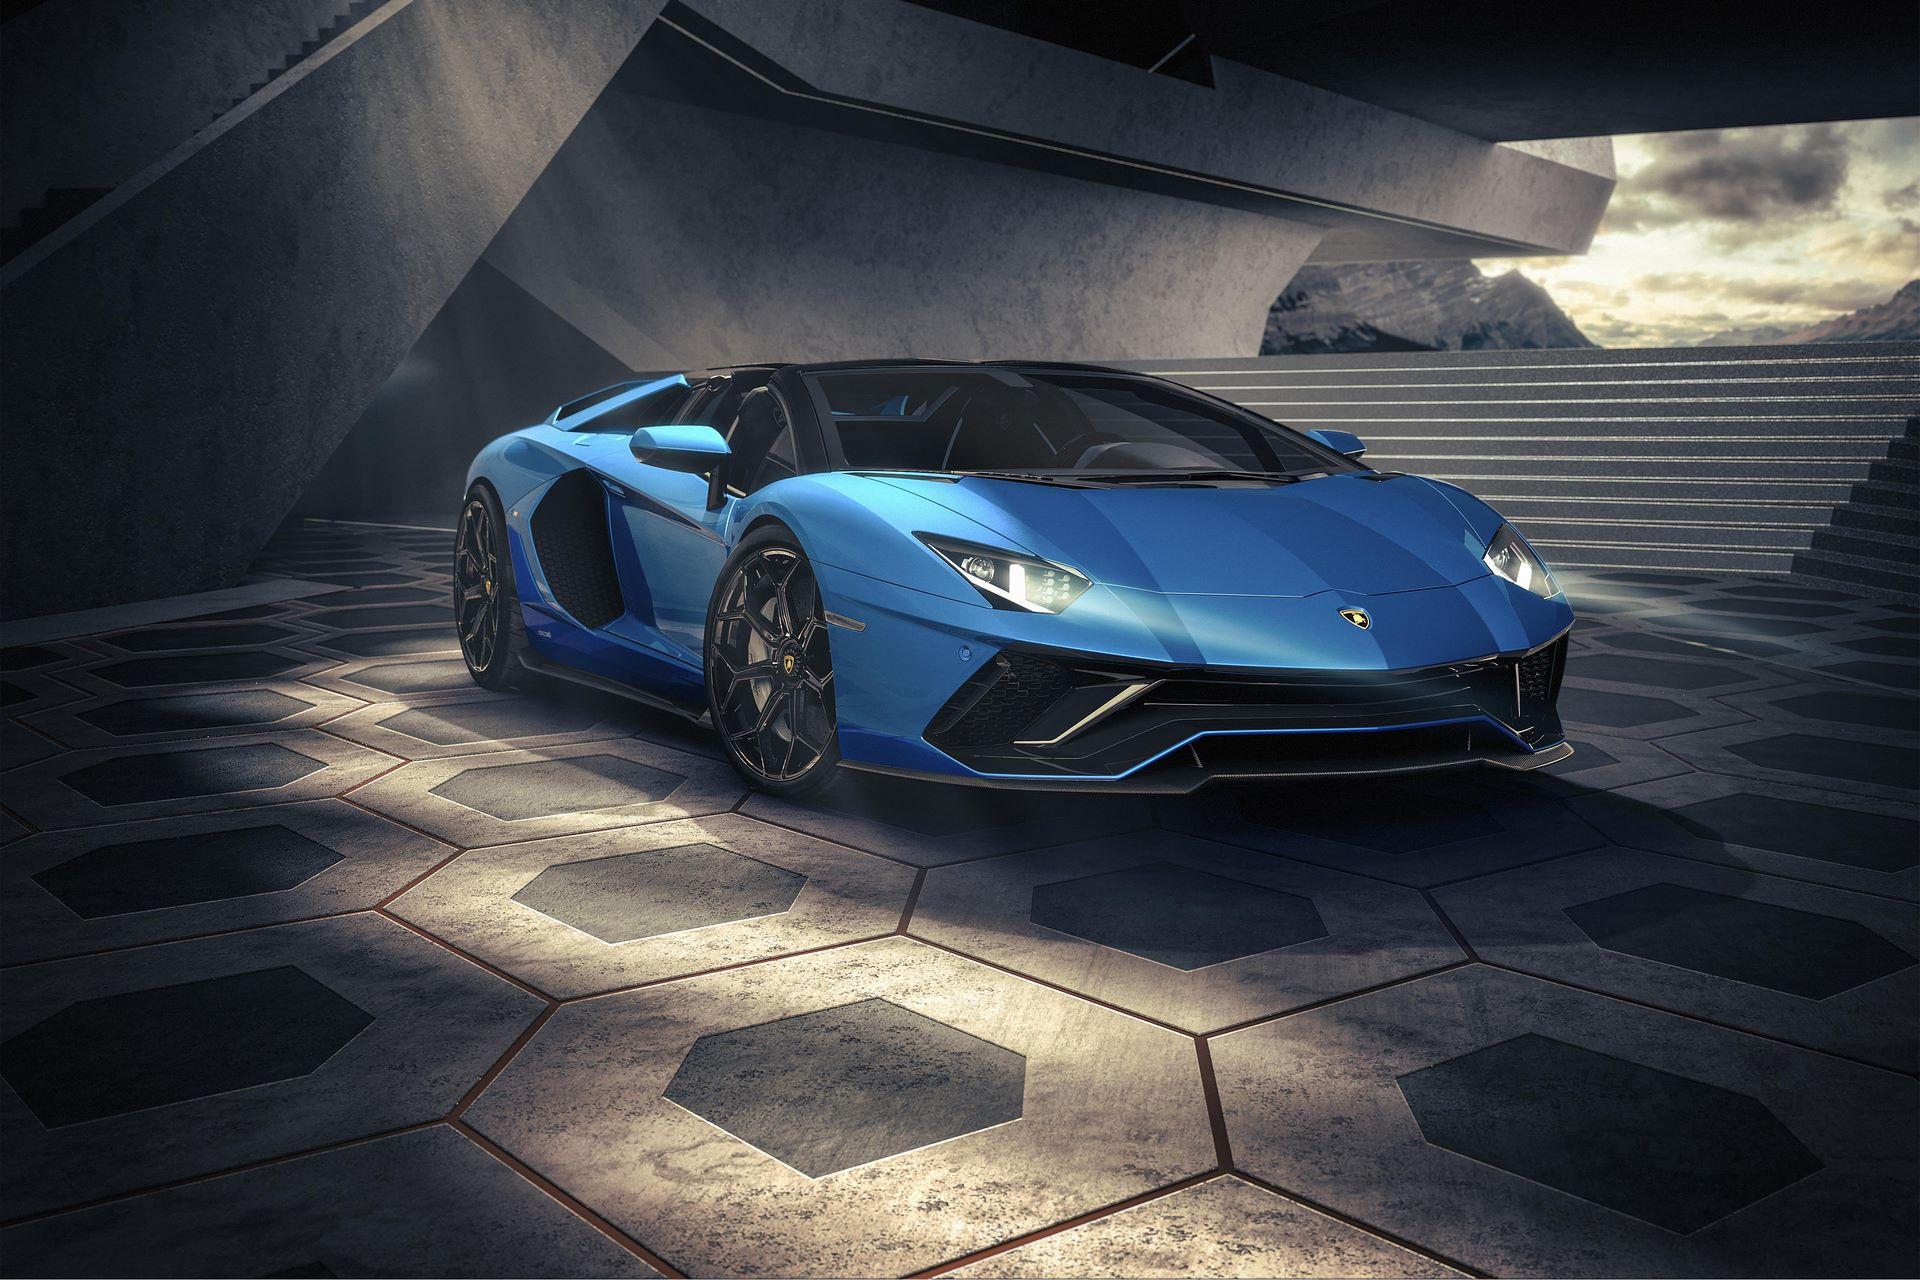 Lamborghini-Aventador-LP780-4-Ultimae-23